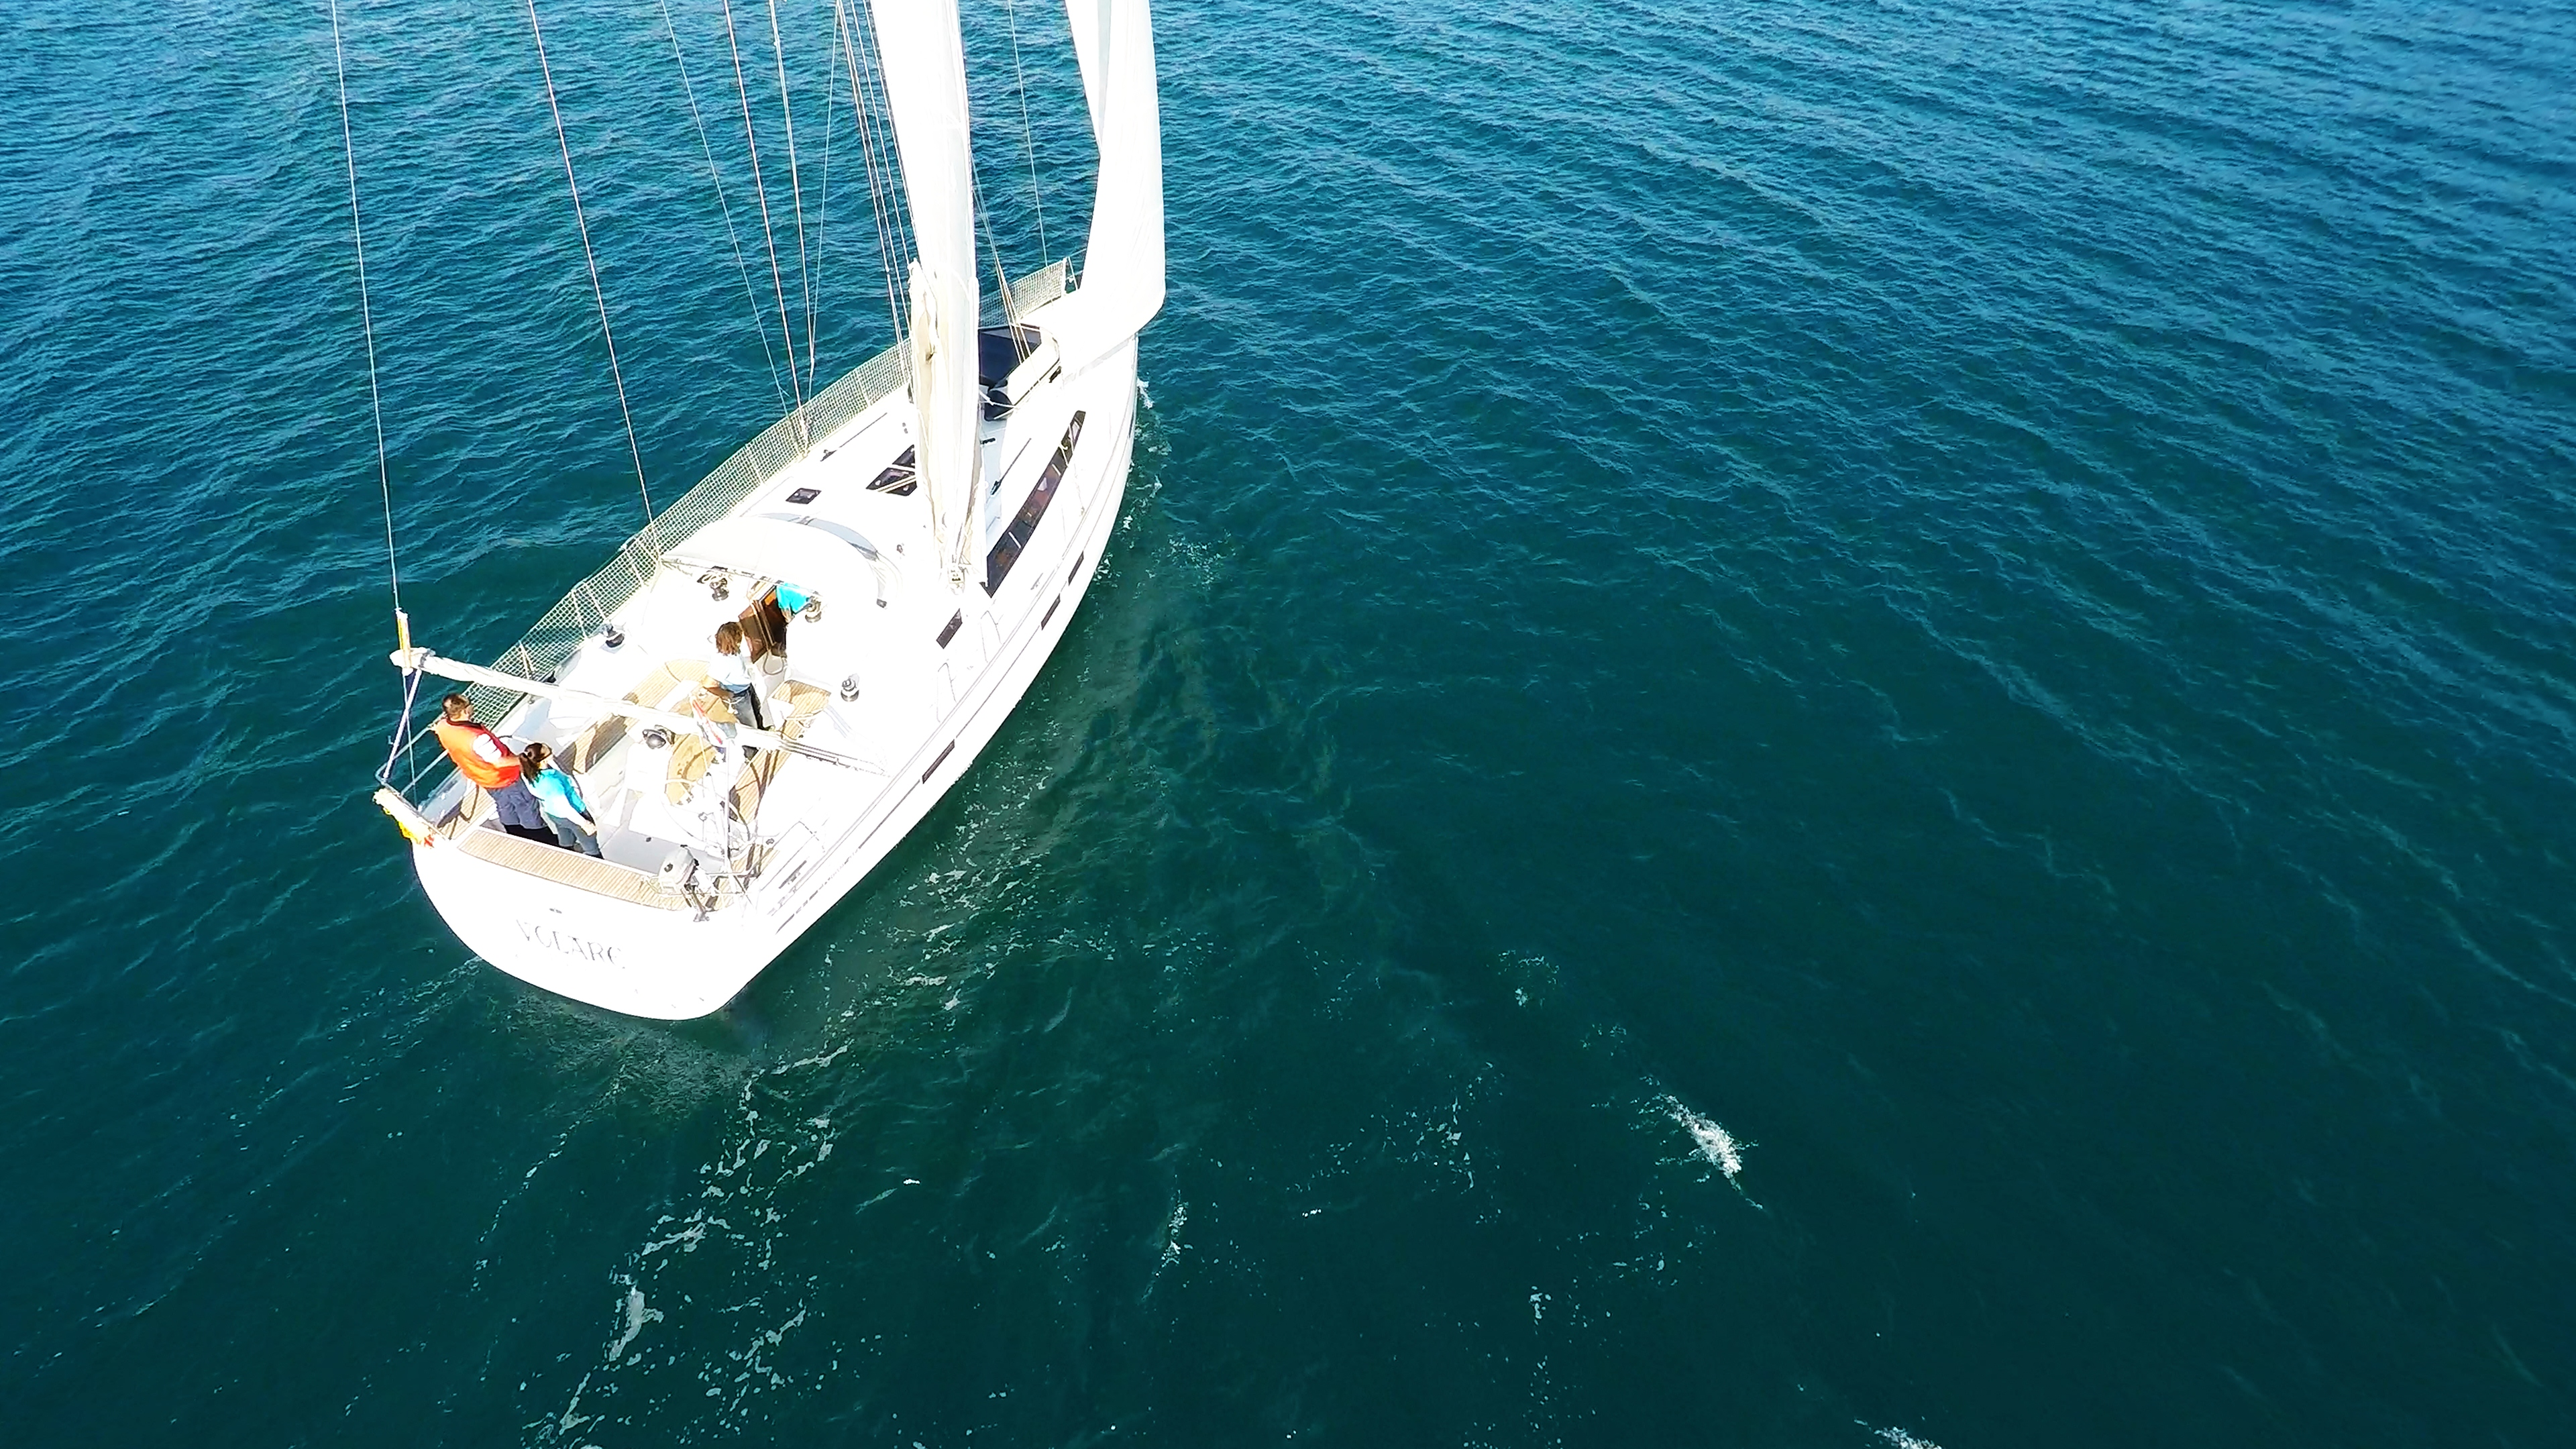 barcha a vela bavaria 46 yacht a vela pozzetto timoni ruota vele